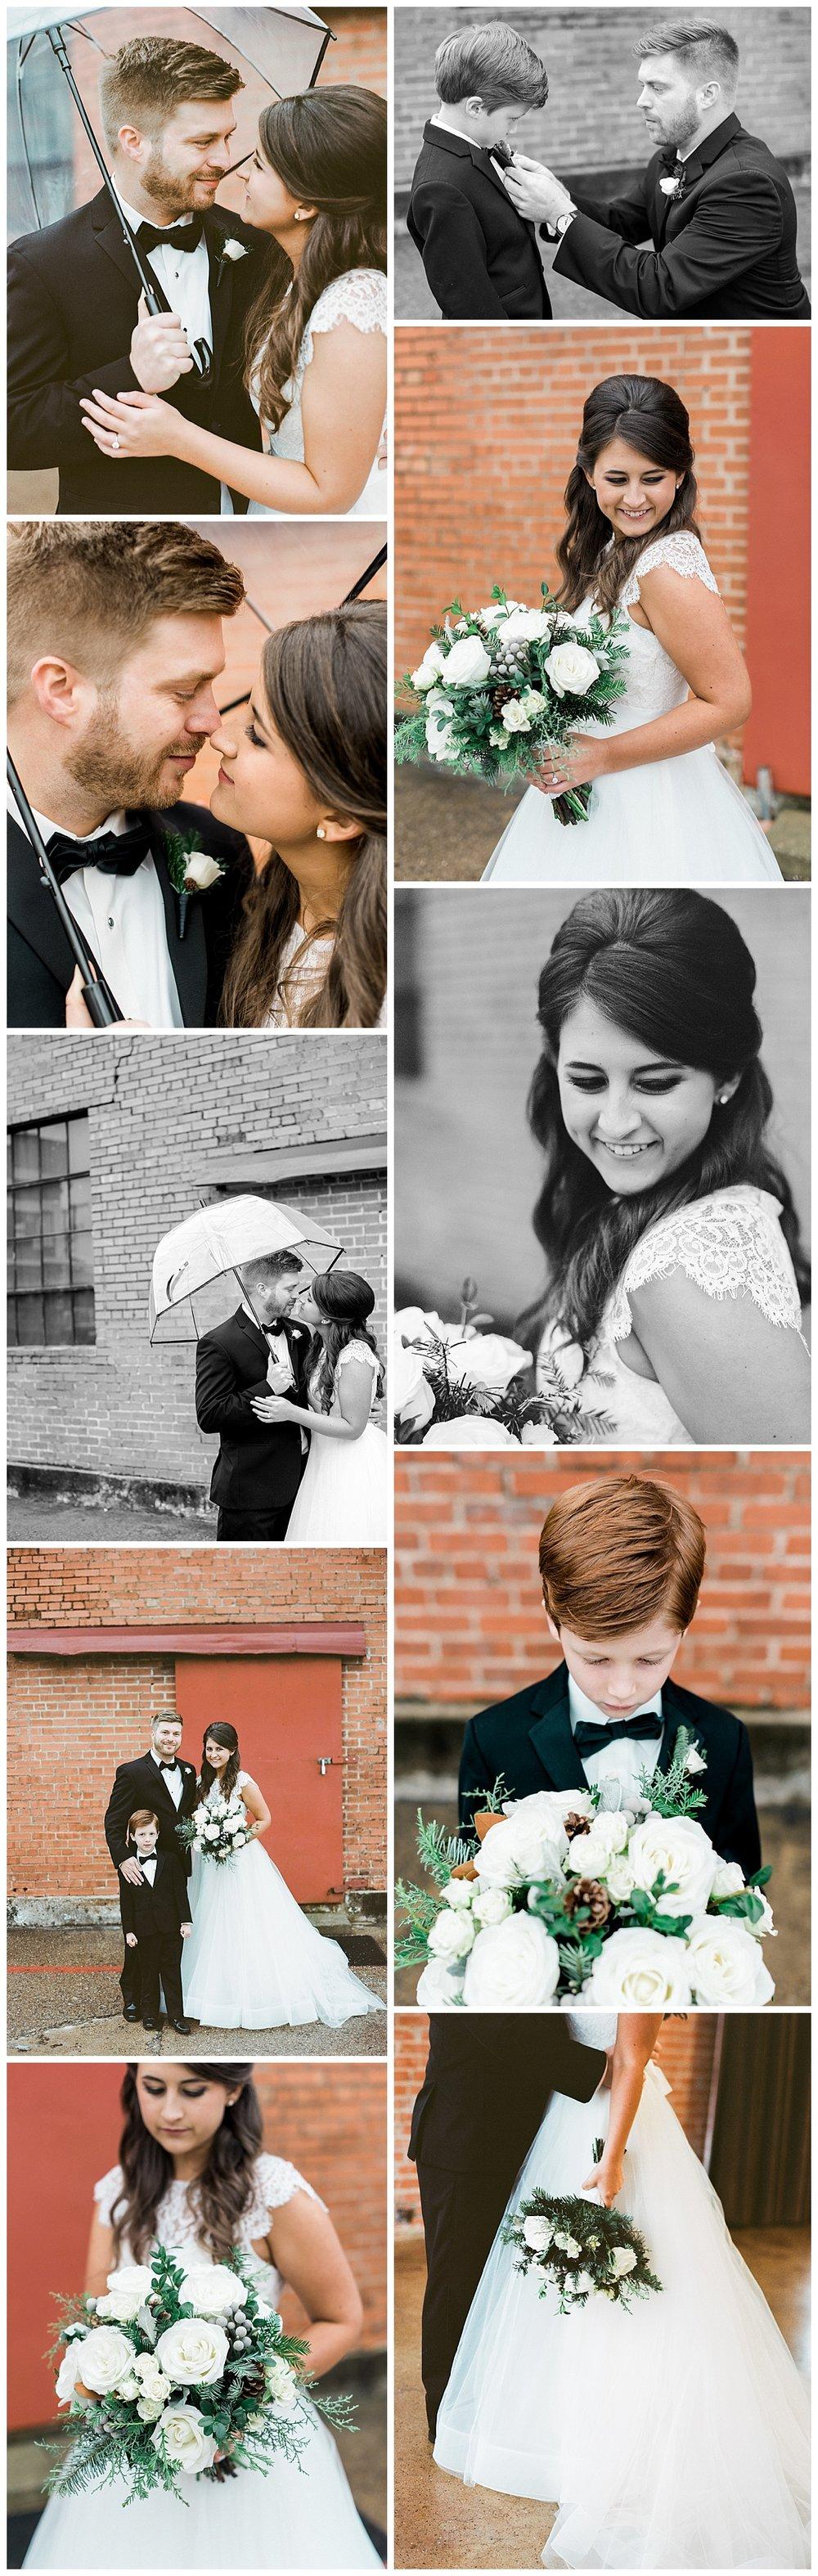 hickory-street-annex-wedding-ar-photography-7.jpg